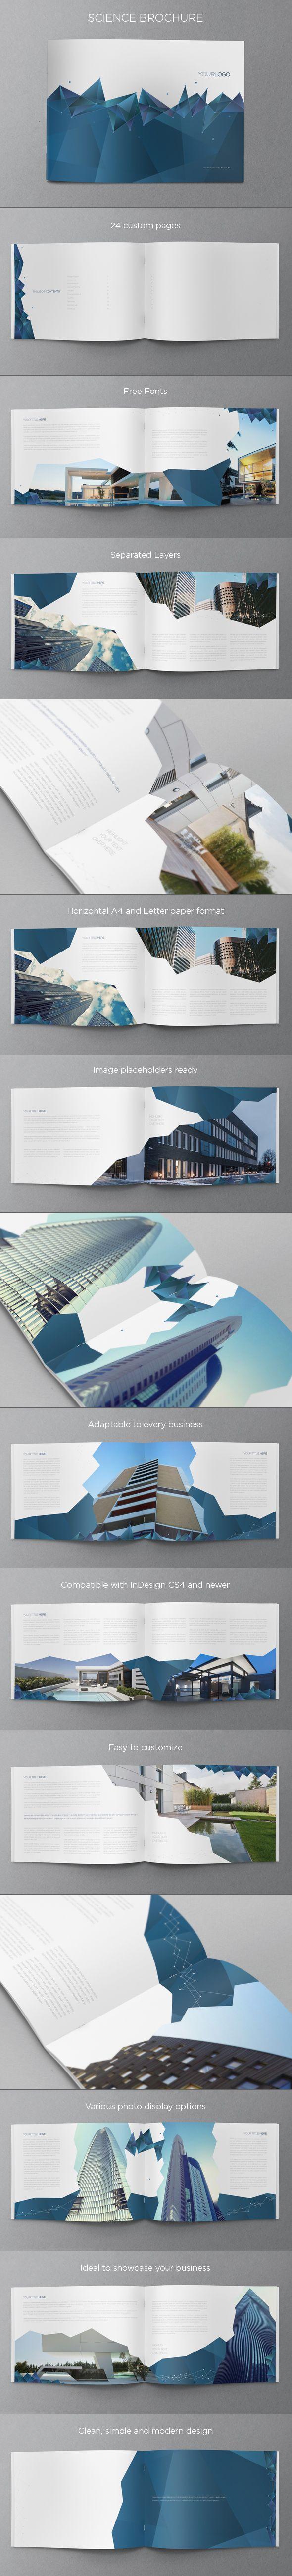 Science Brochure. Download here: http://graphicriver.net/item/science-brochure/5680739?ref=abradesign #design #brochure